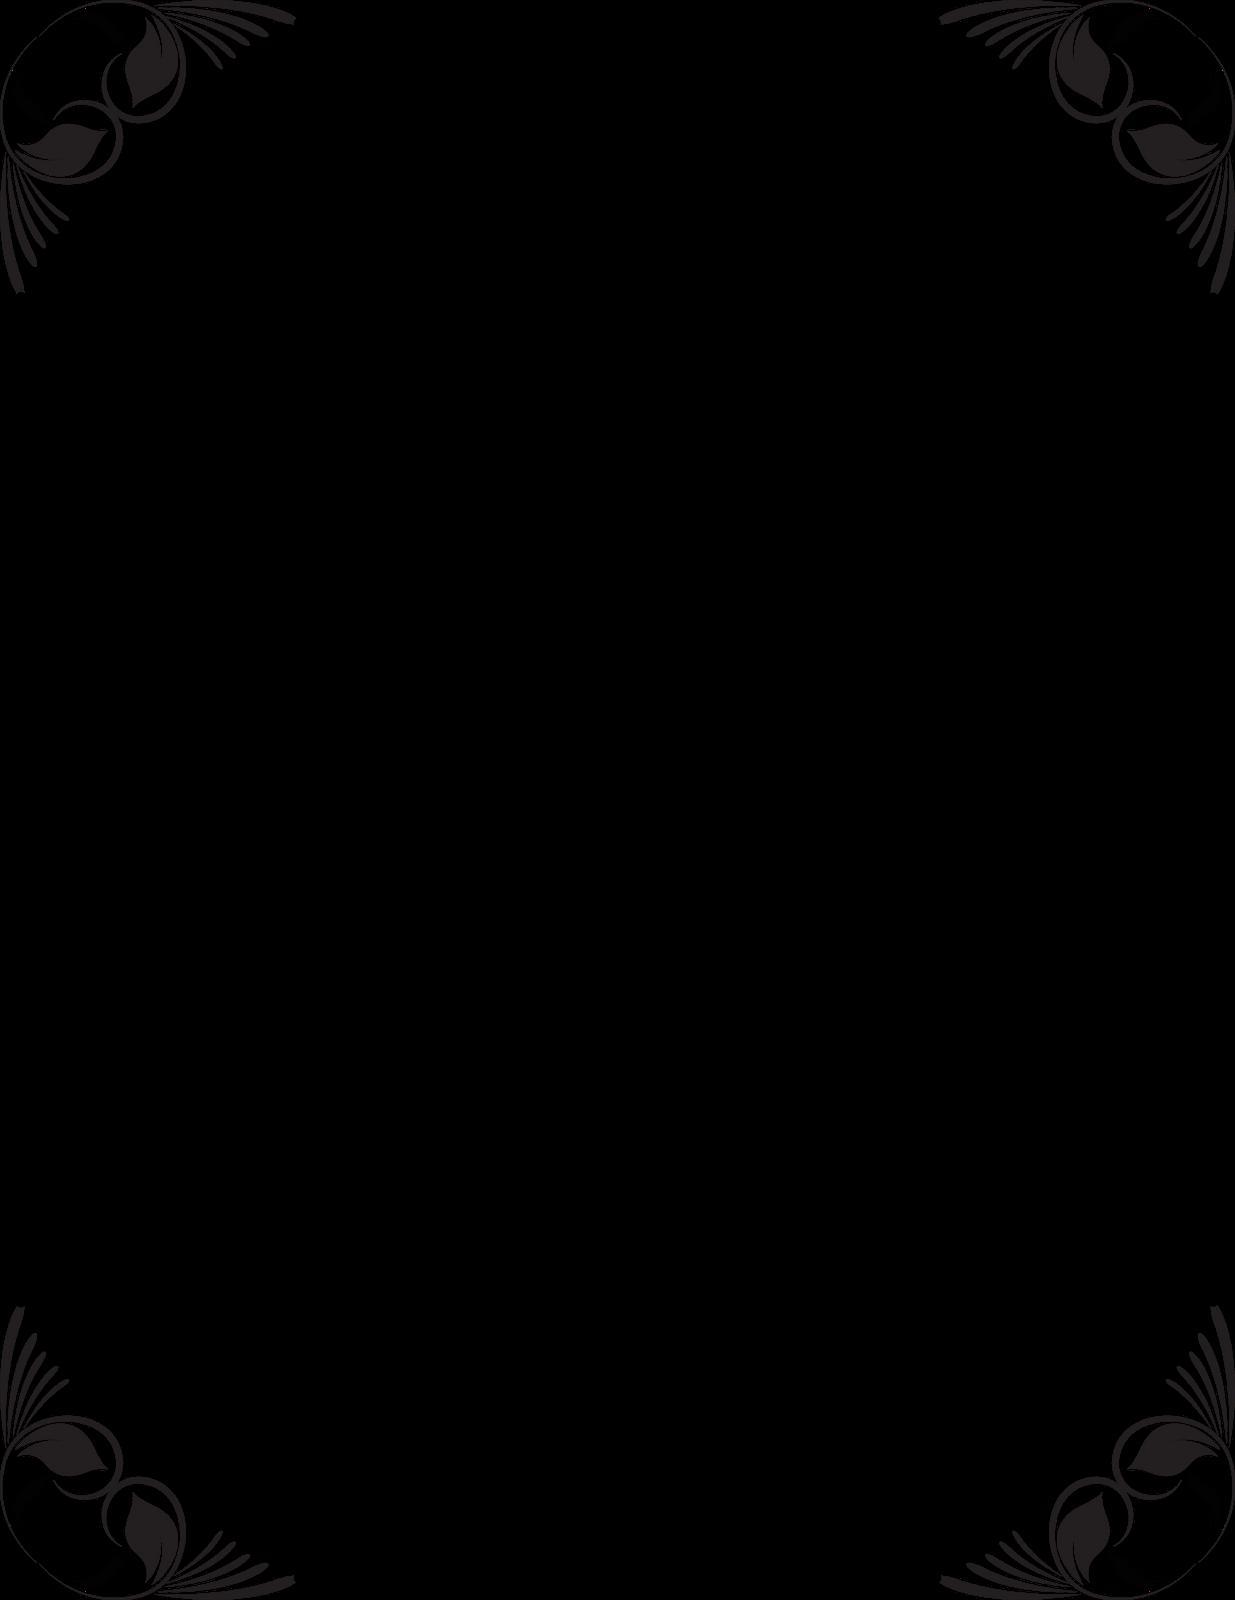 Flower frames design black and white viewframes flower frame black and white google search molduras marcos y mightylinksfo